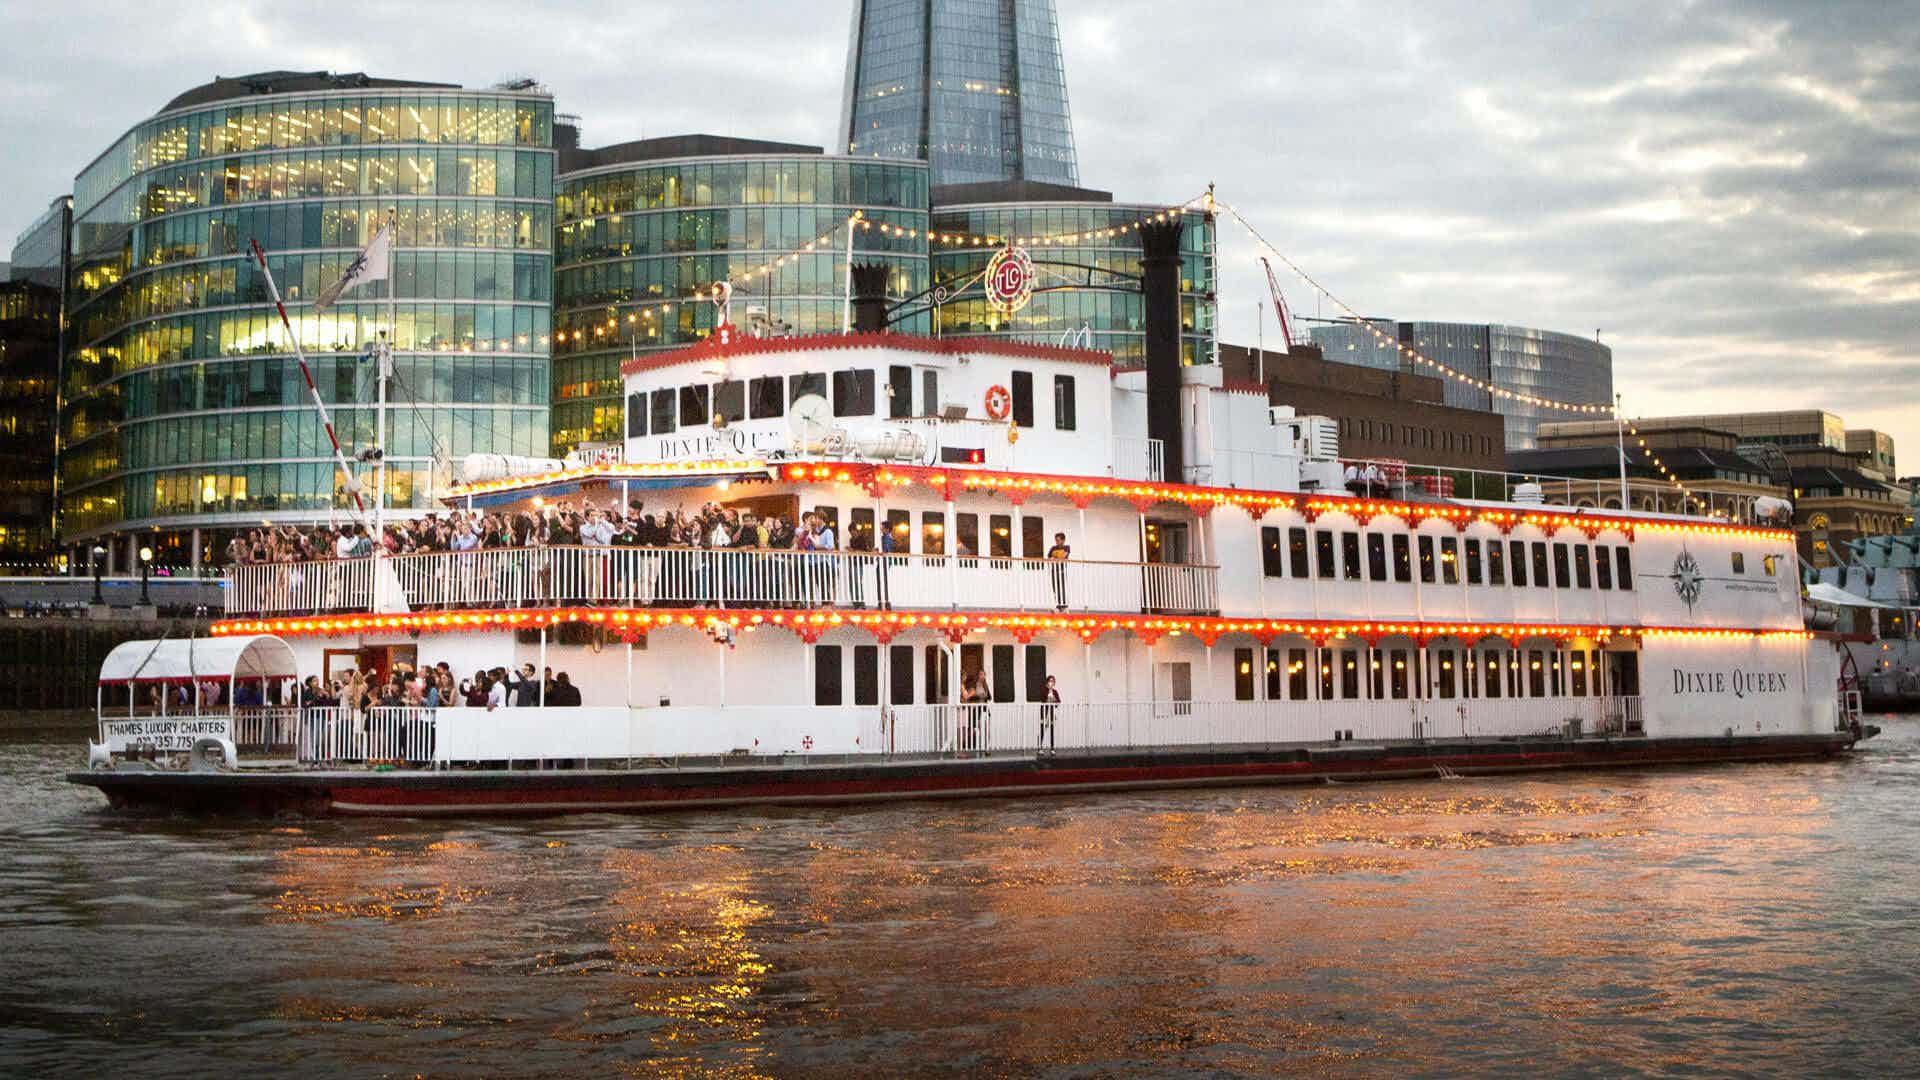 Whole Venue, Dixie Queen – Thames Luxury Charters